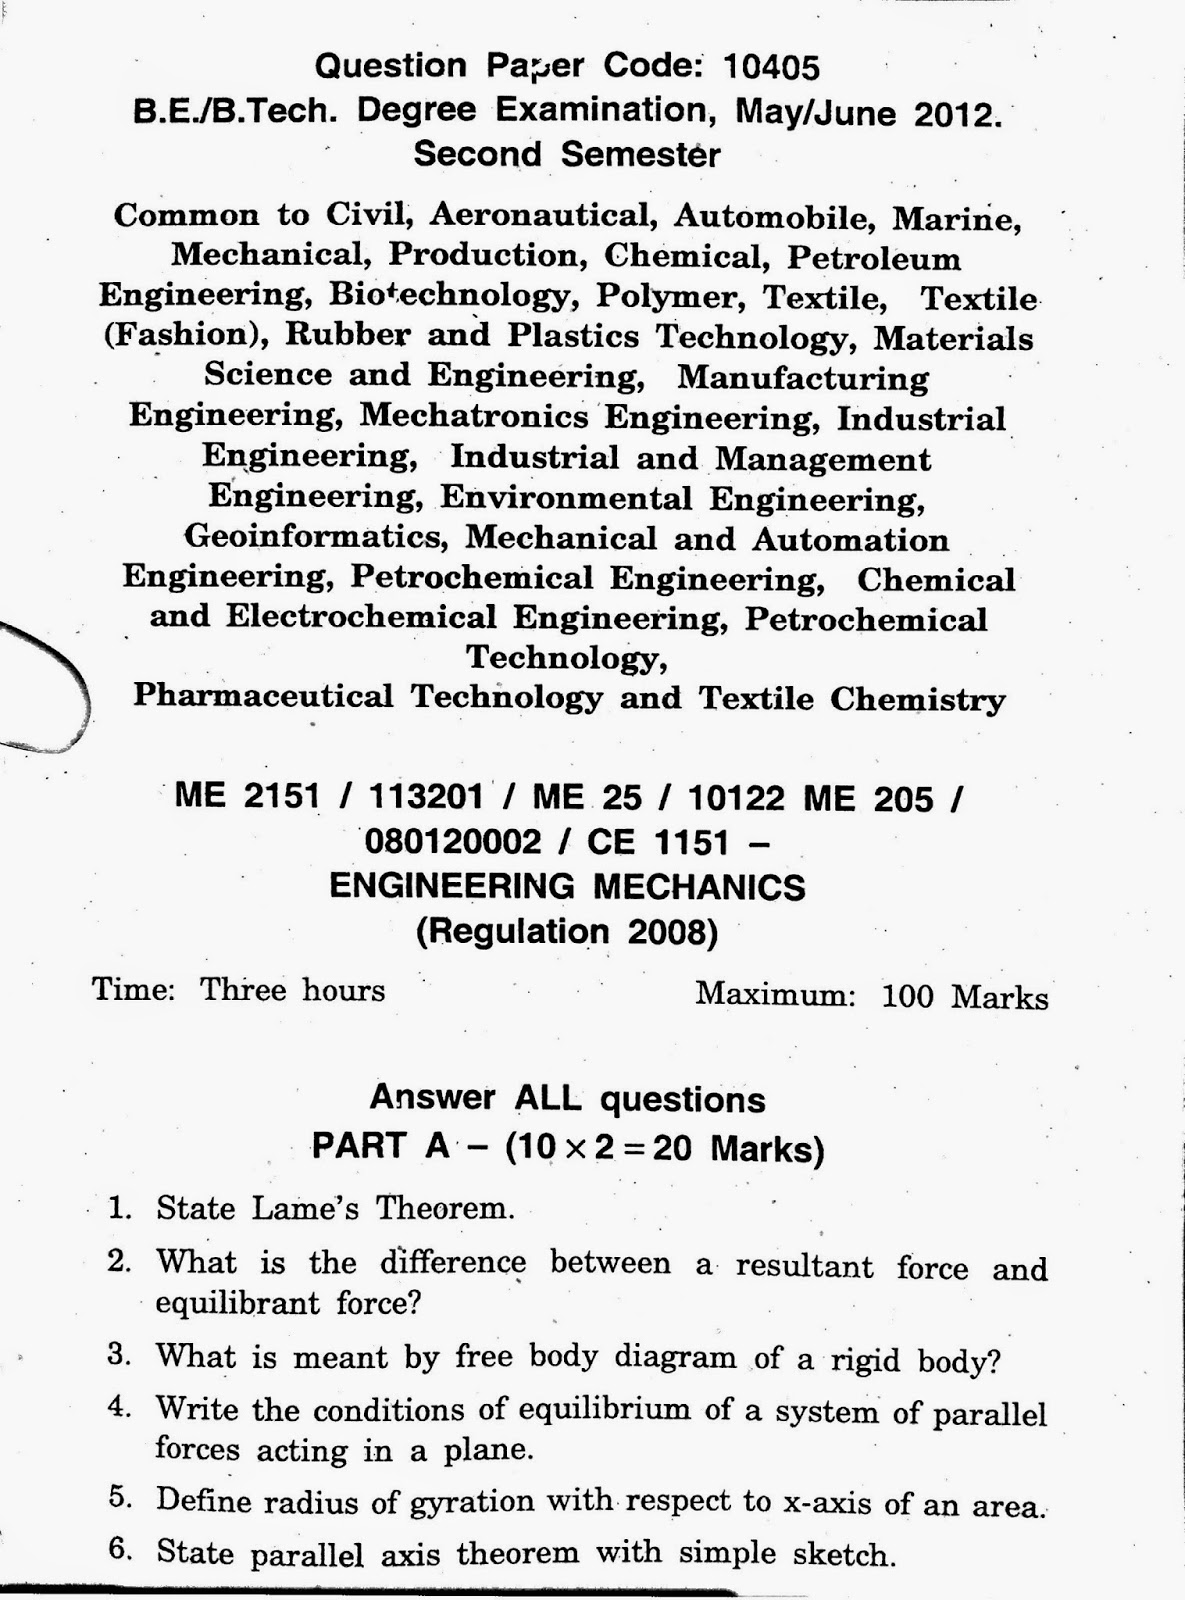 Calicut university study materials